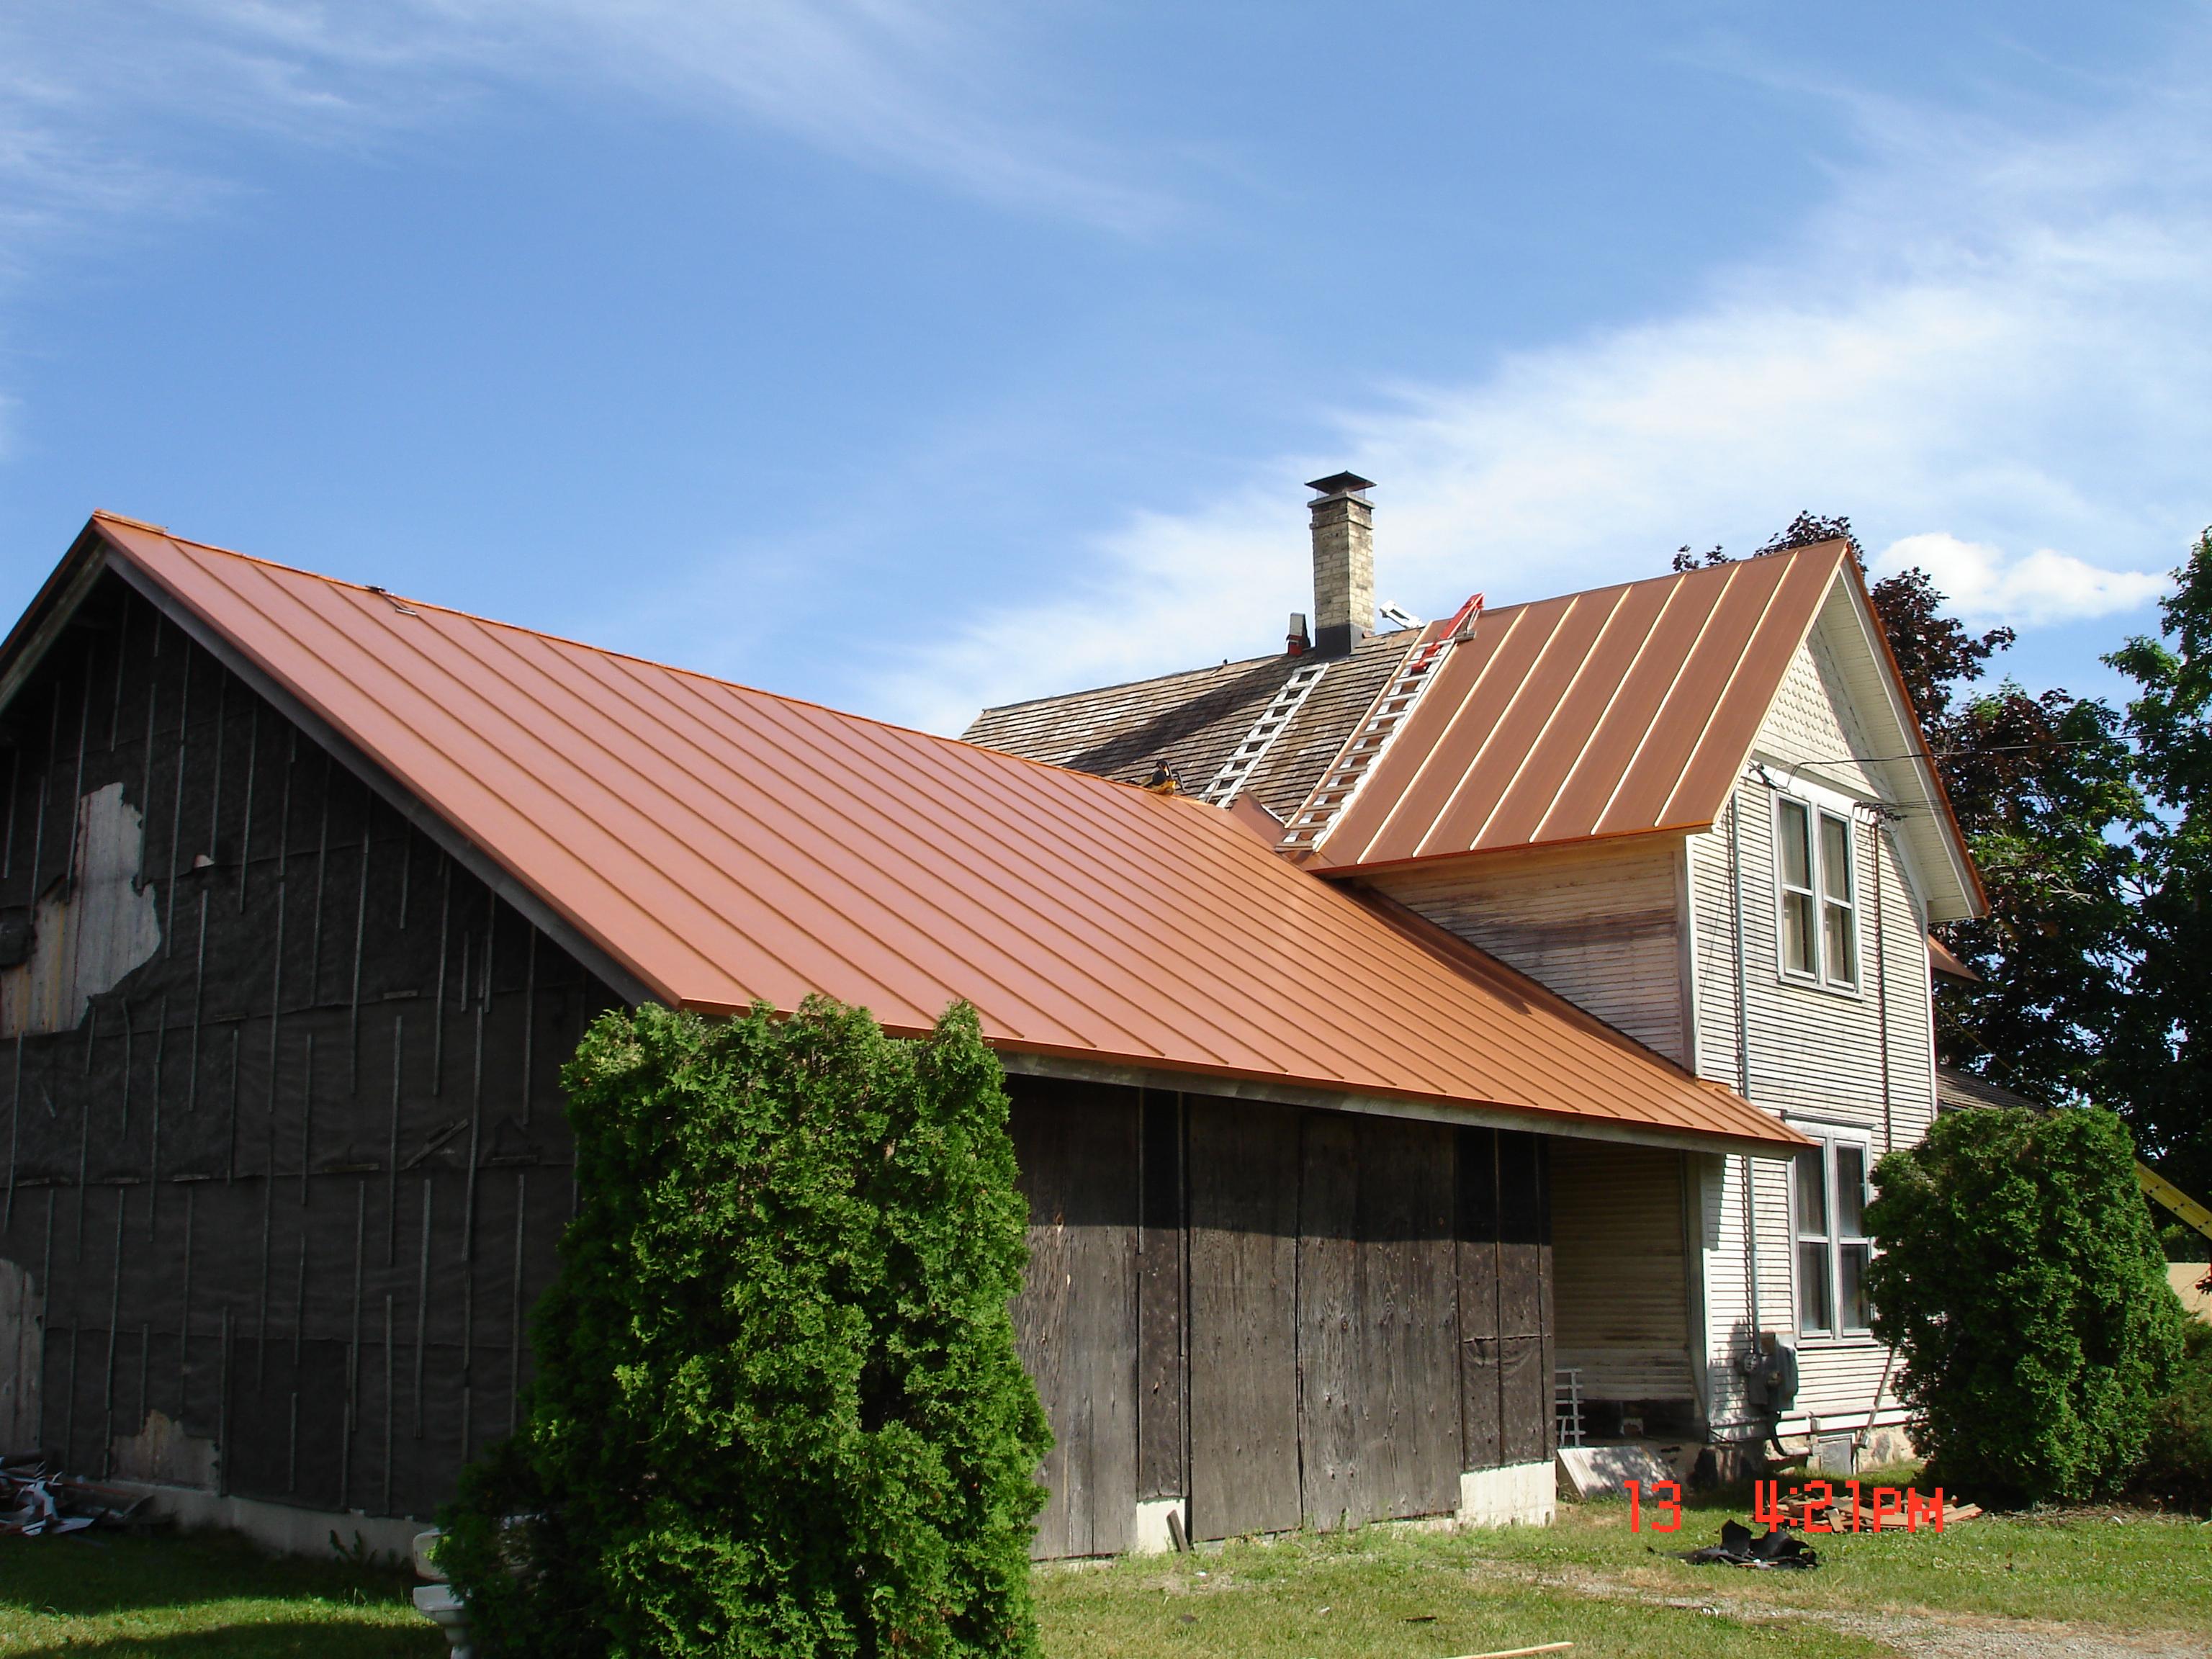 sheet Metal roofing standing seam house residential copper wisconsin iowa illinois minnesota north dakota